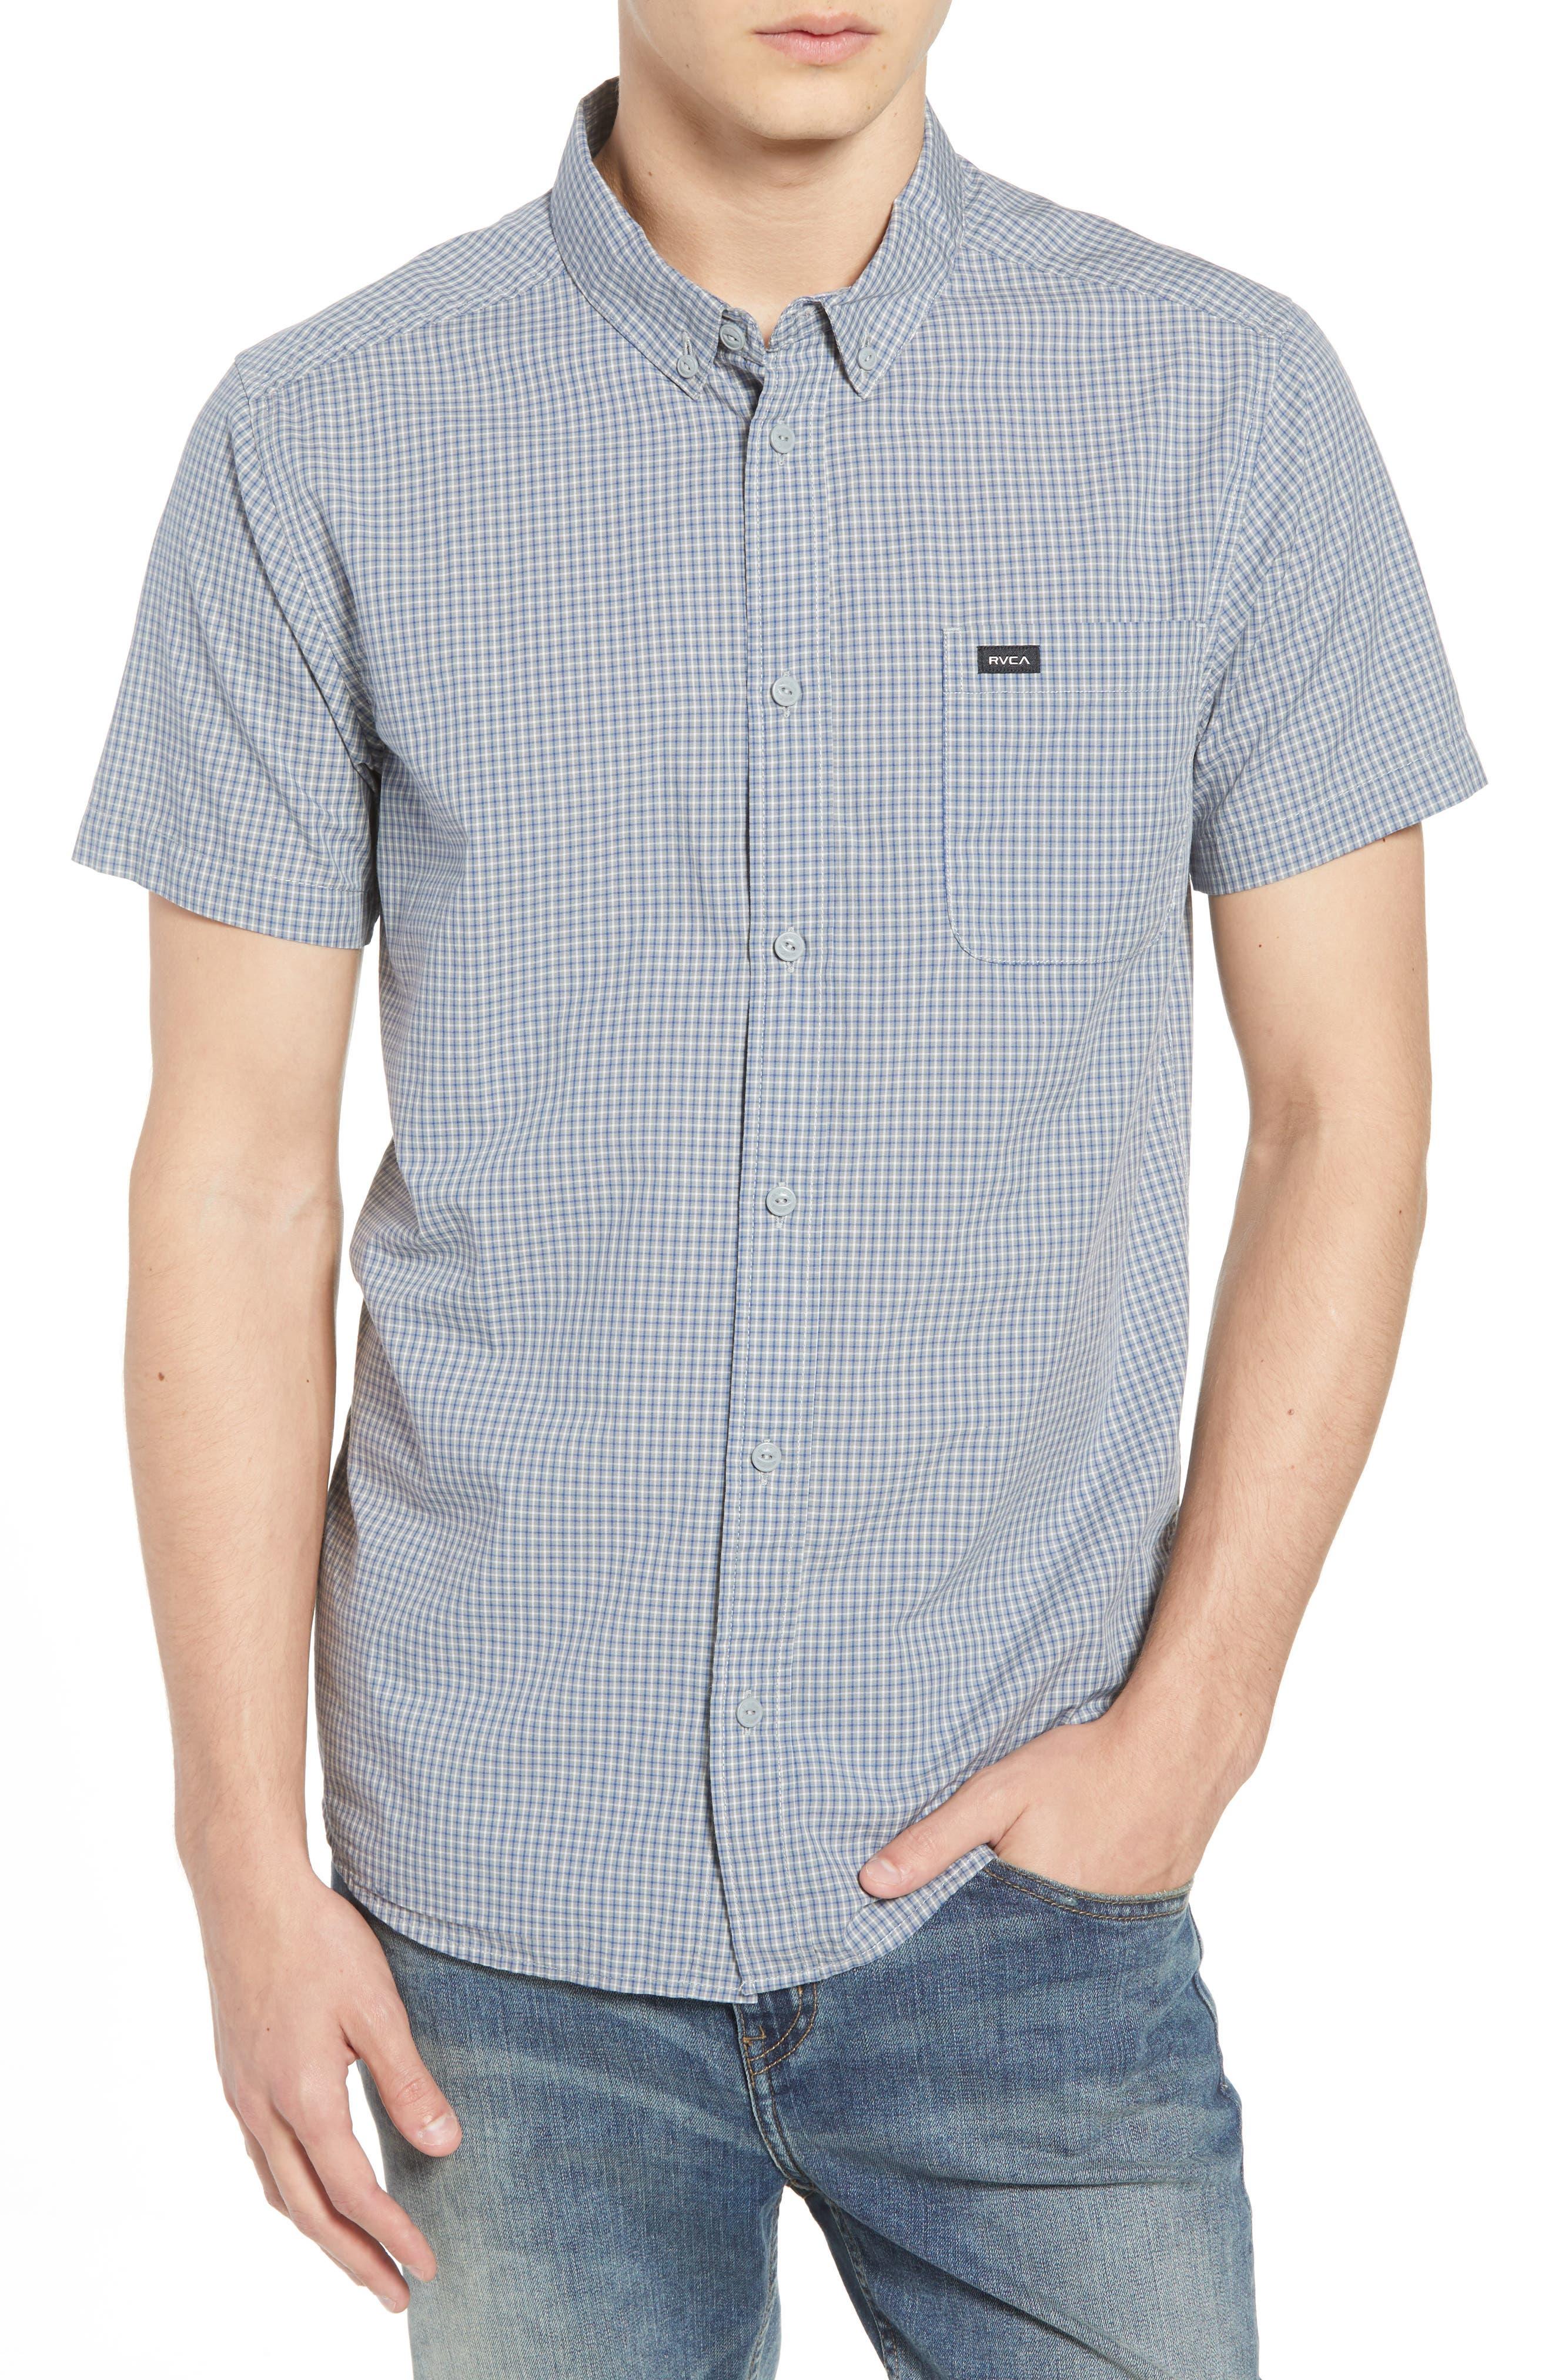 Staple Woven Shirt,                             Main thumbnail 1, color,                             026